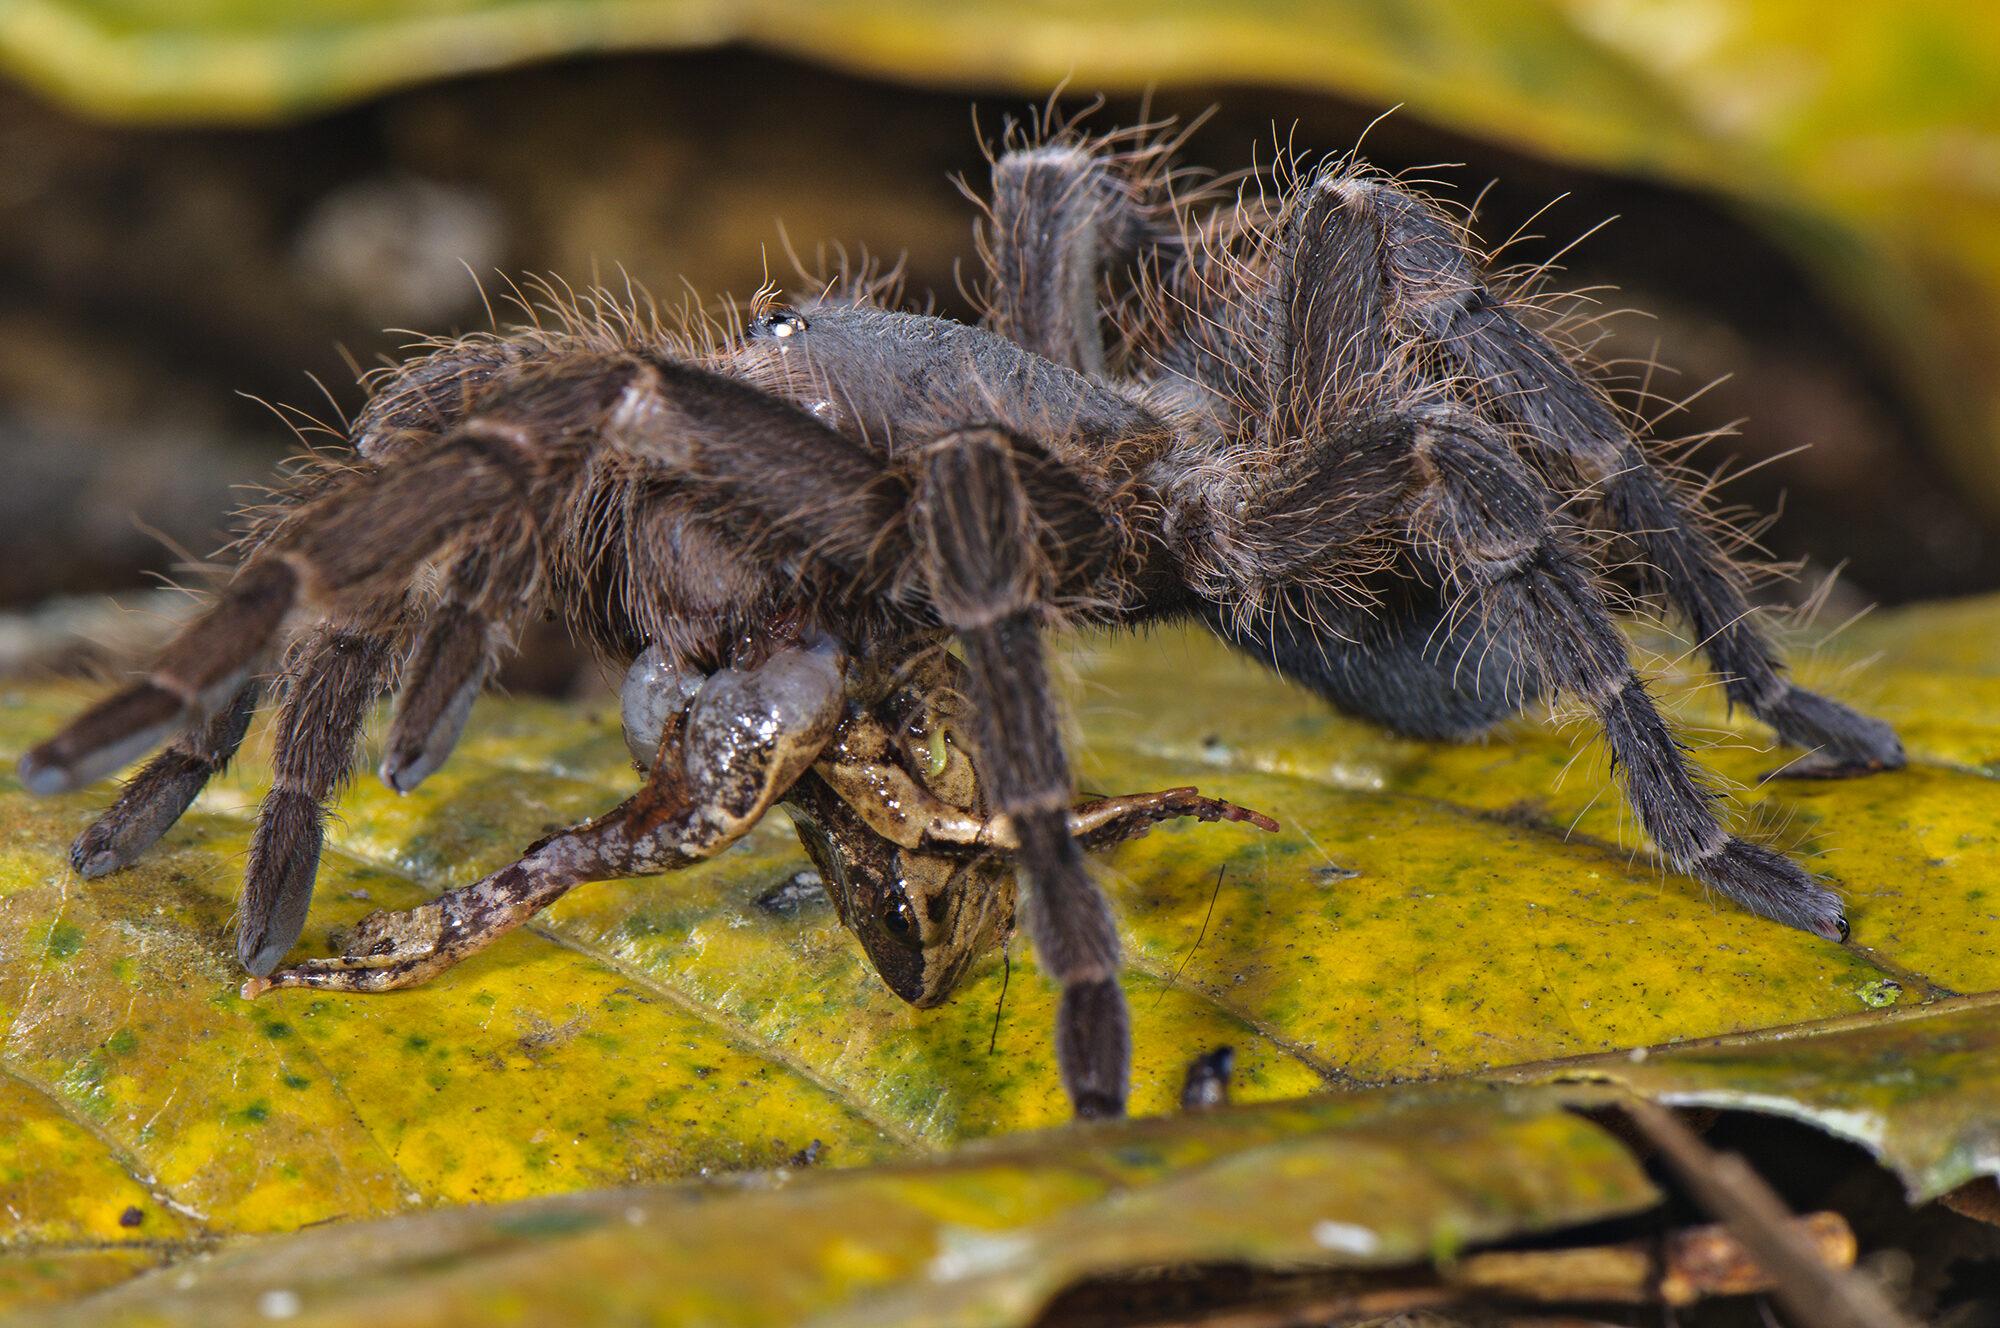 U-M biologists capture super-creepy photos of Amazon spiders